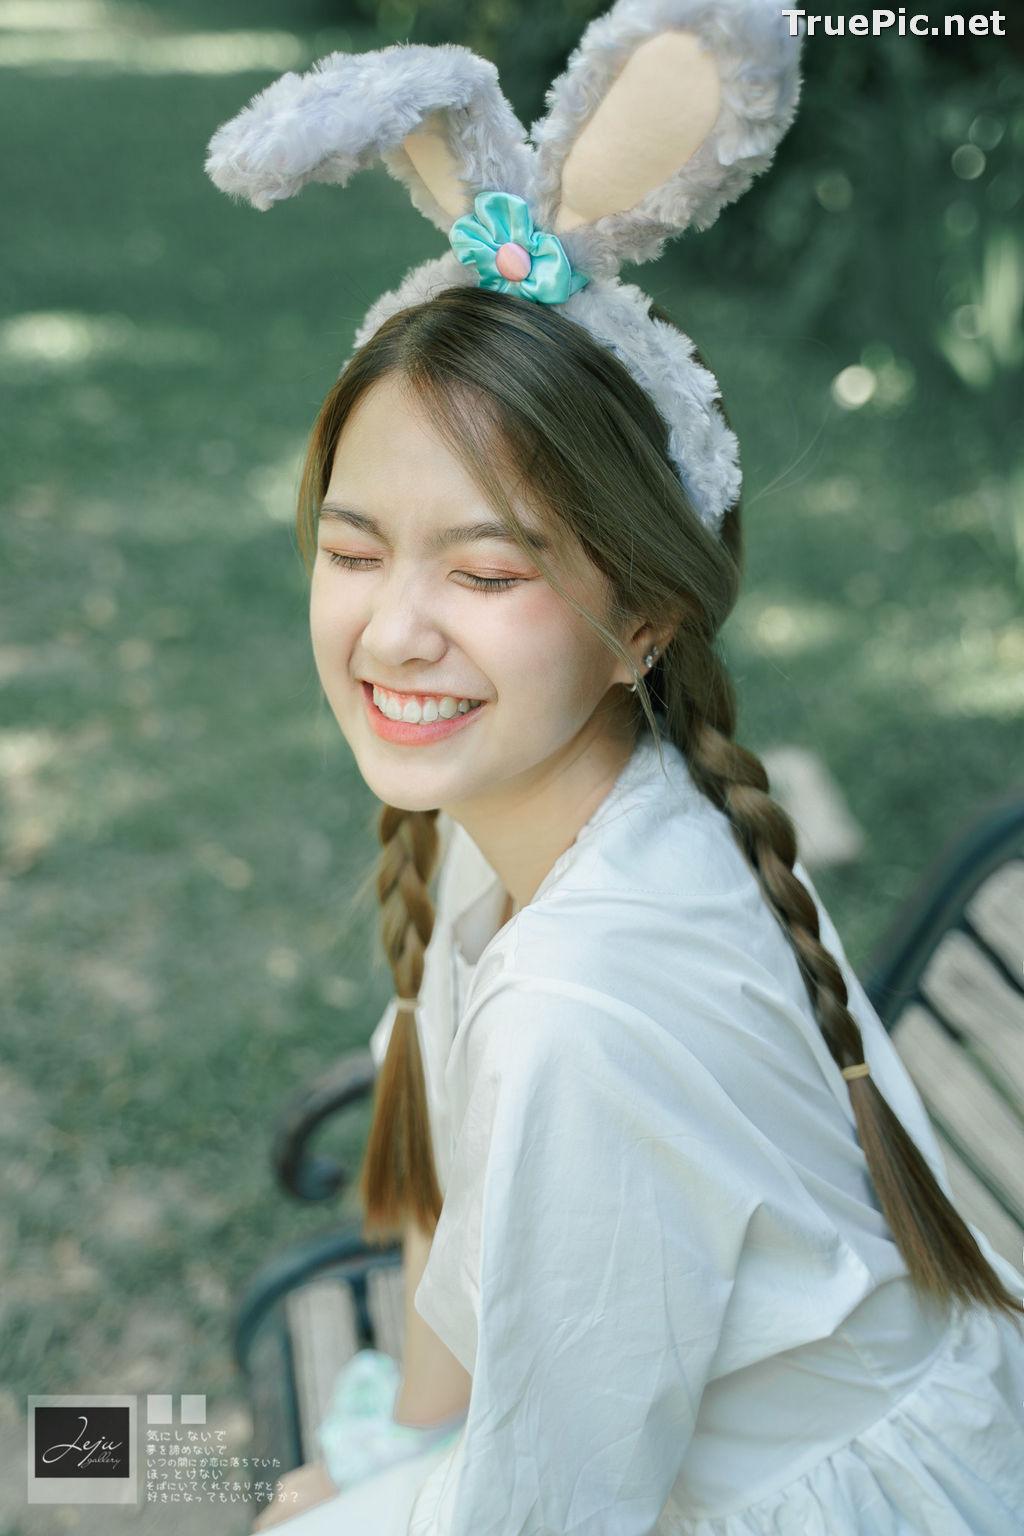 Image Thailand Cute Model - Napat Cdhg - Gam Bunny Girl - TruePic.net - Picture-4